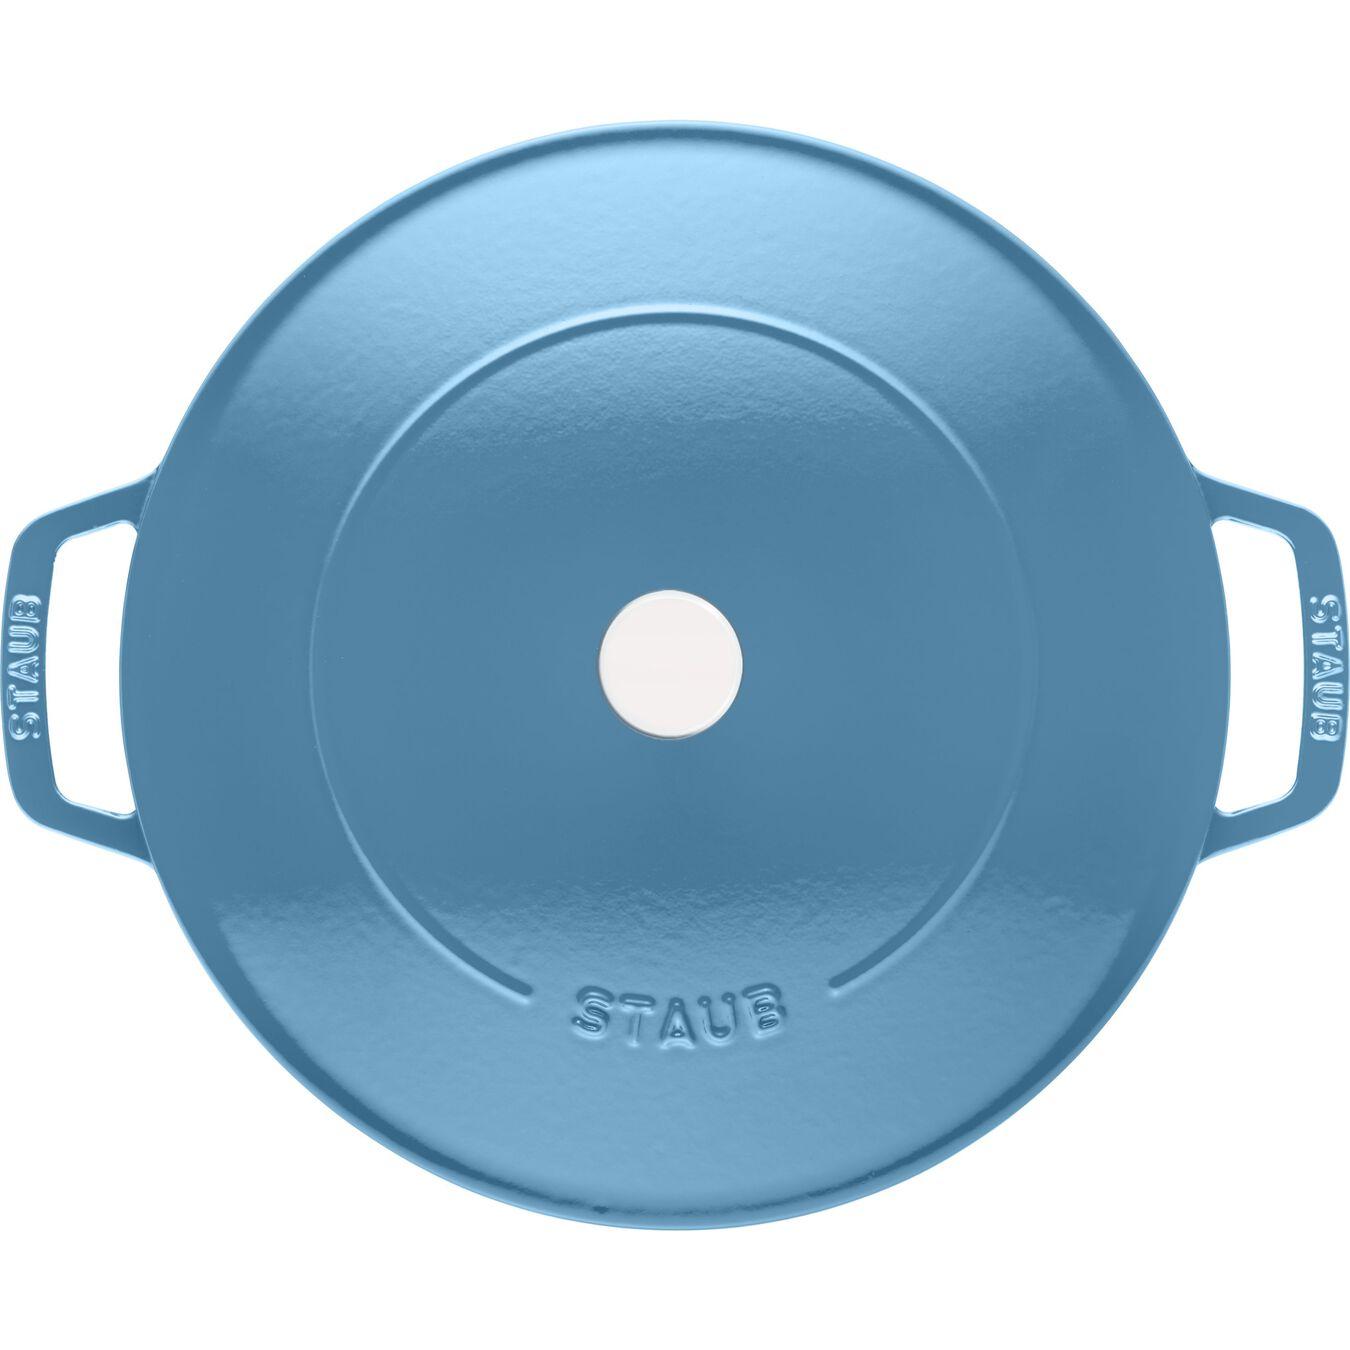 3.75 l round Saute pan Chistera, ice-blue,,large 4